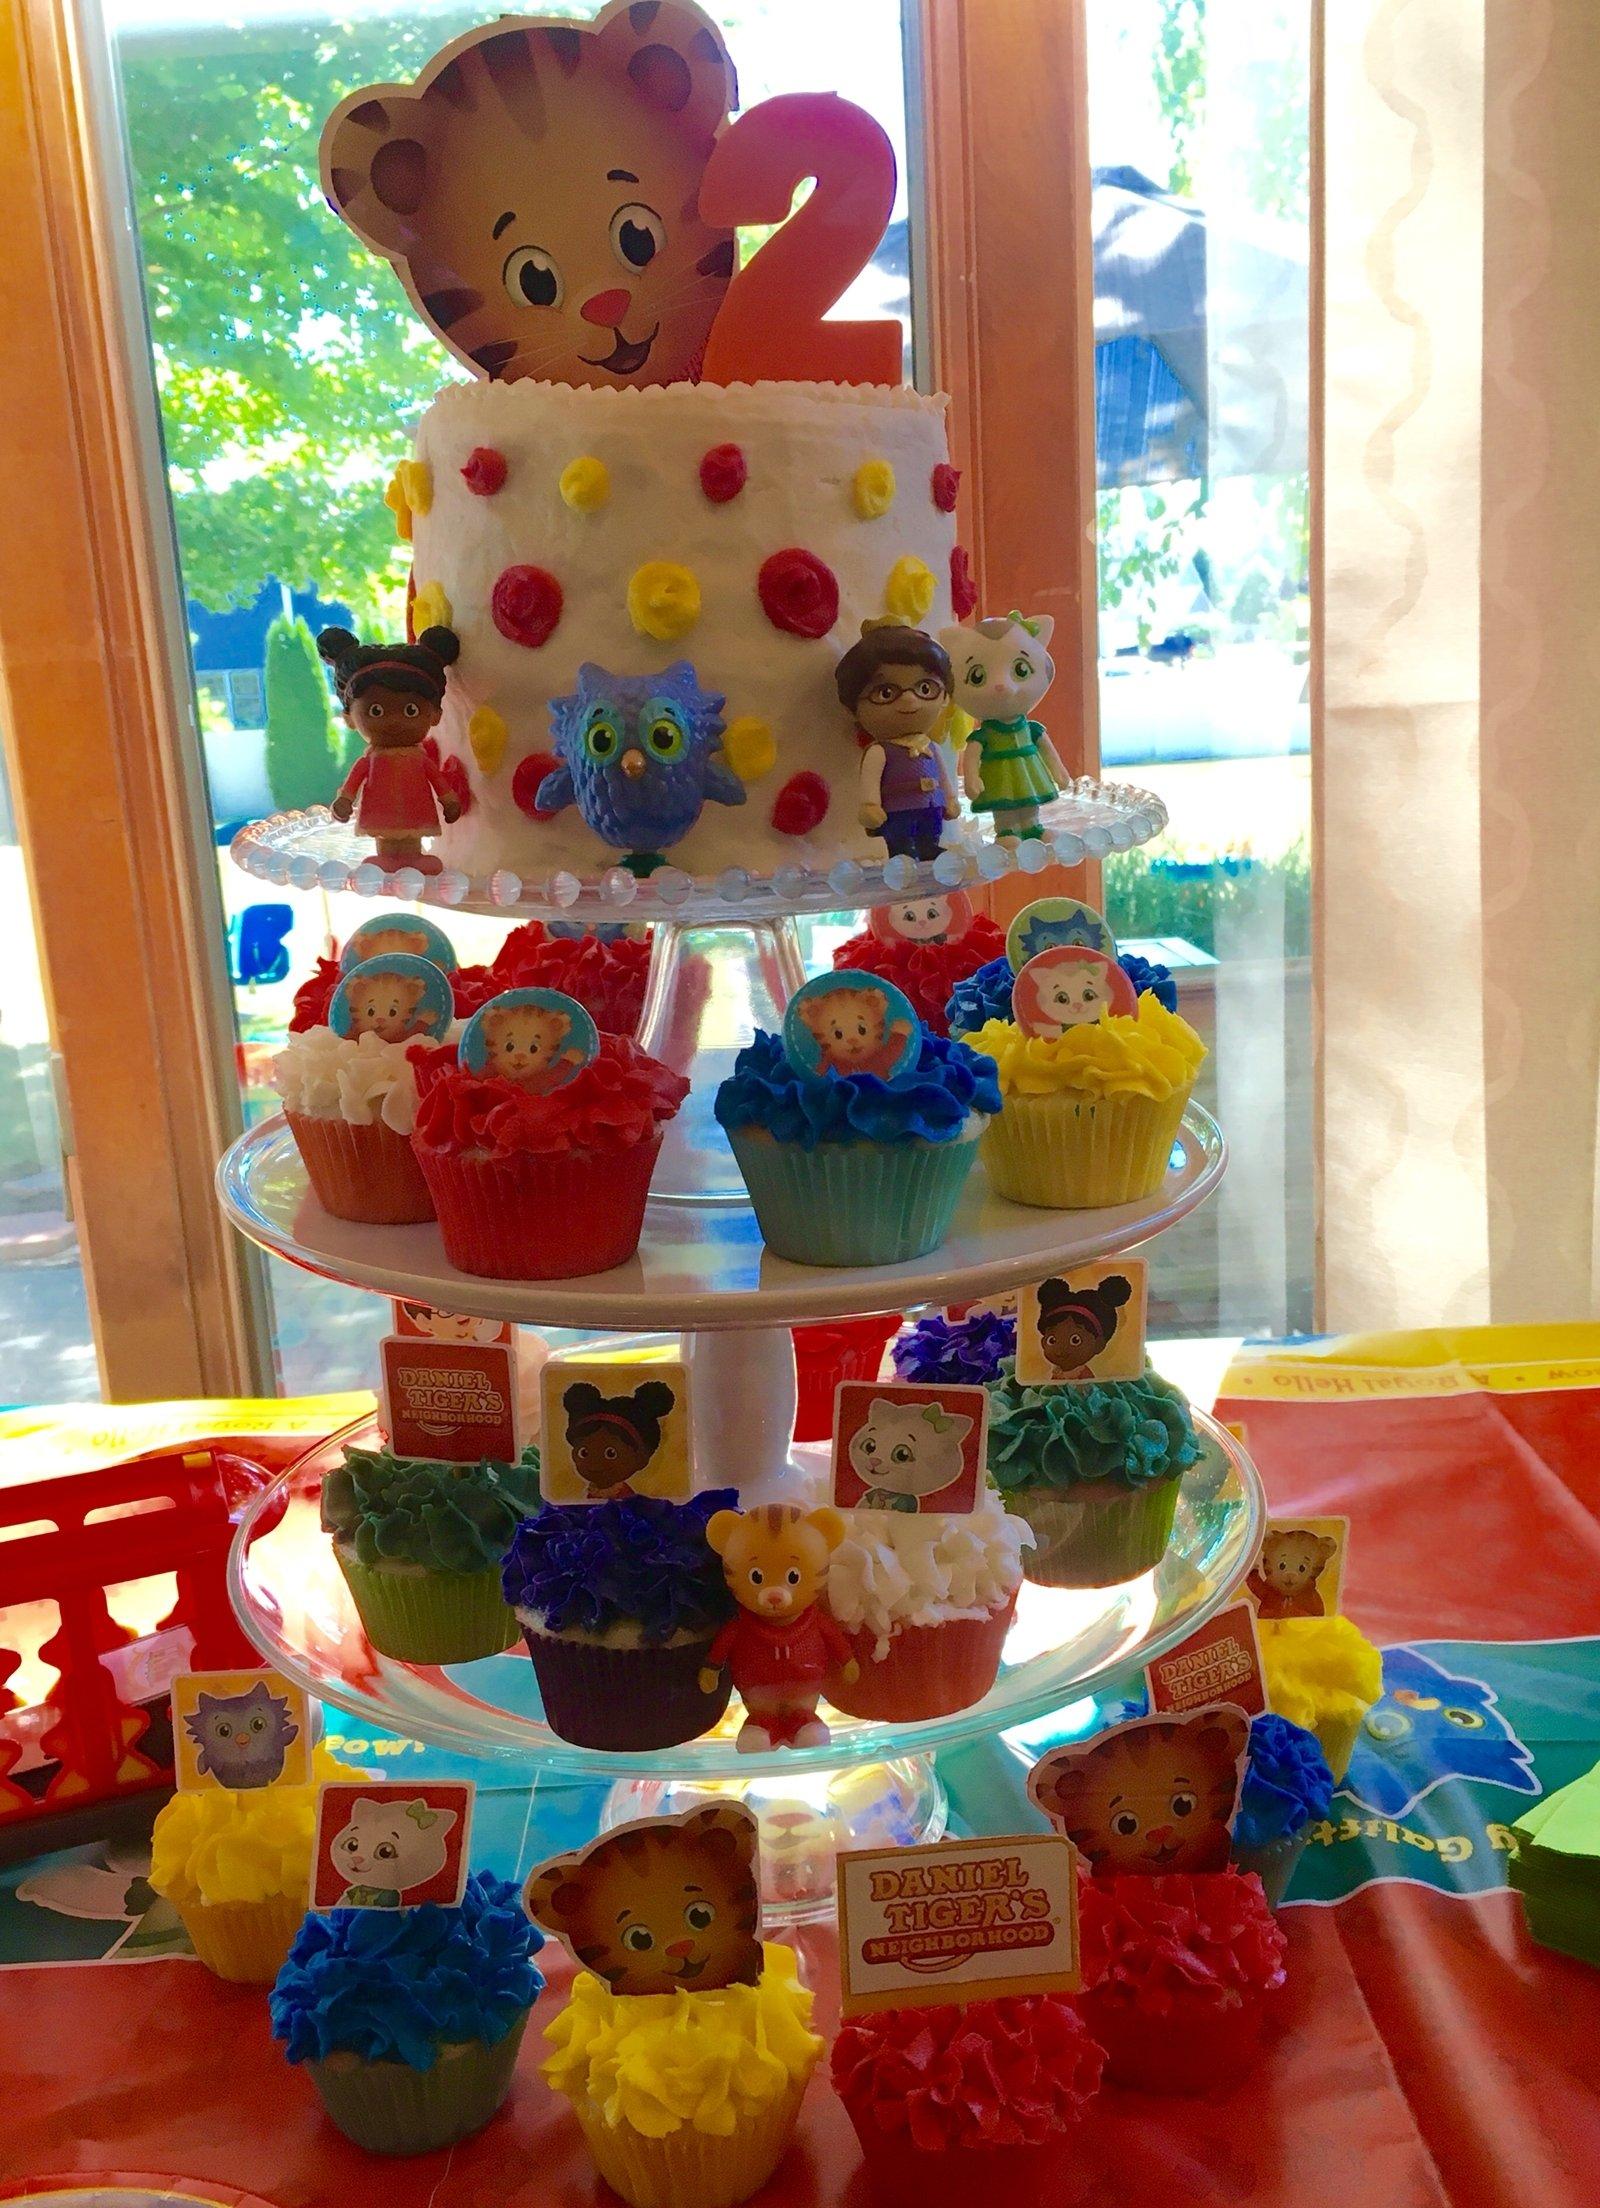 10 Famous Daniel Tiger Birthday Party Ideas daniel tiger birthday cake and cupcakes livias 2nd birthday 2020